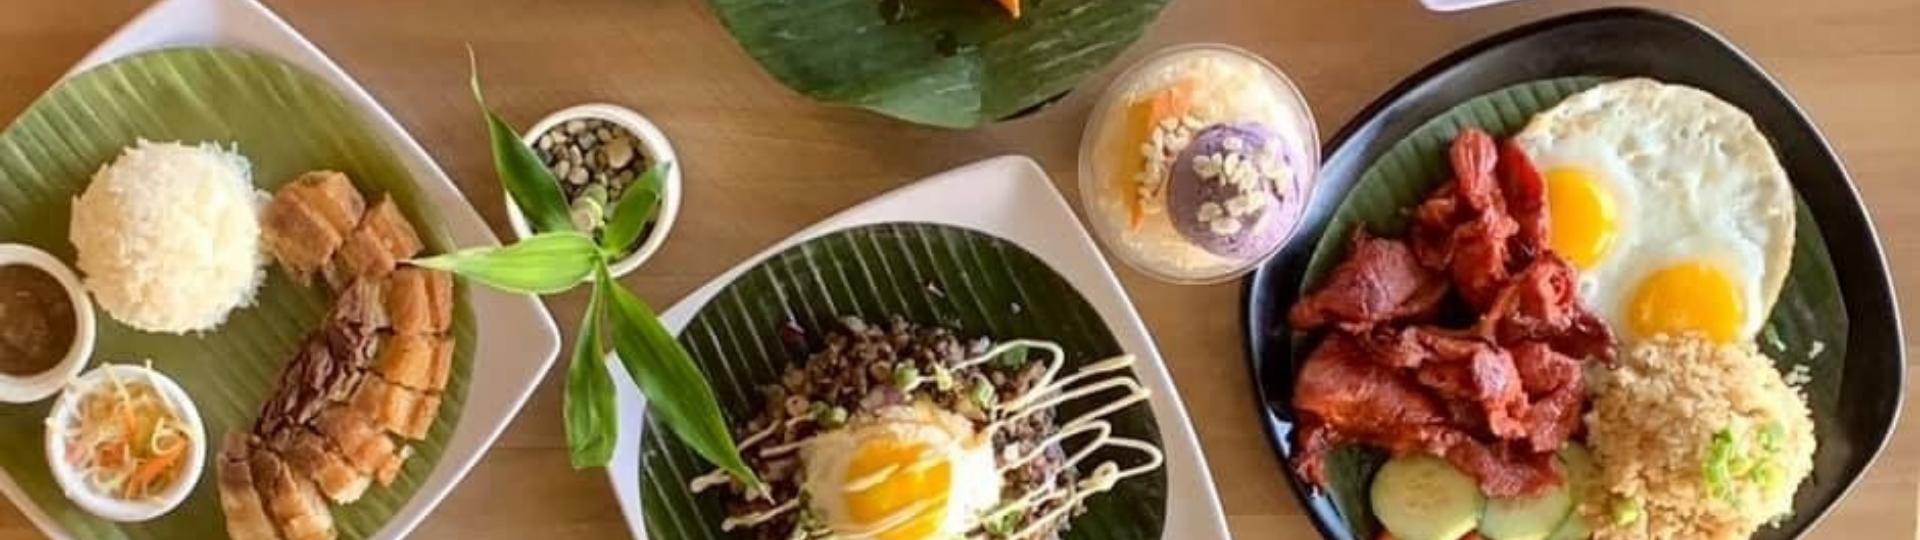 tambayan filipino food